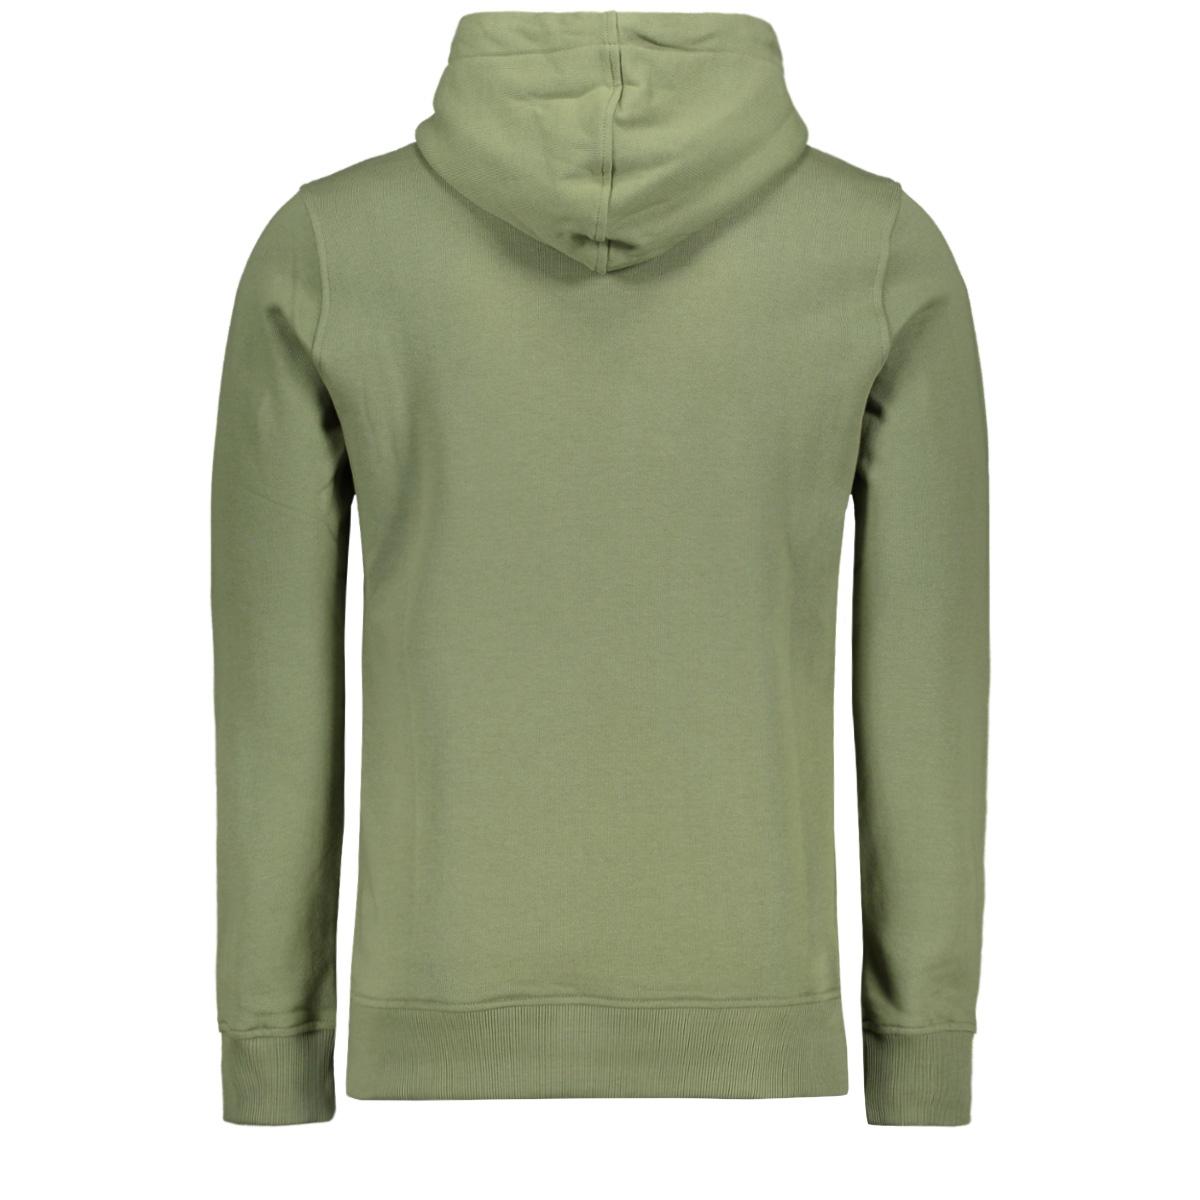 20019302 ballin ss20 ballin sweater lt army